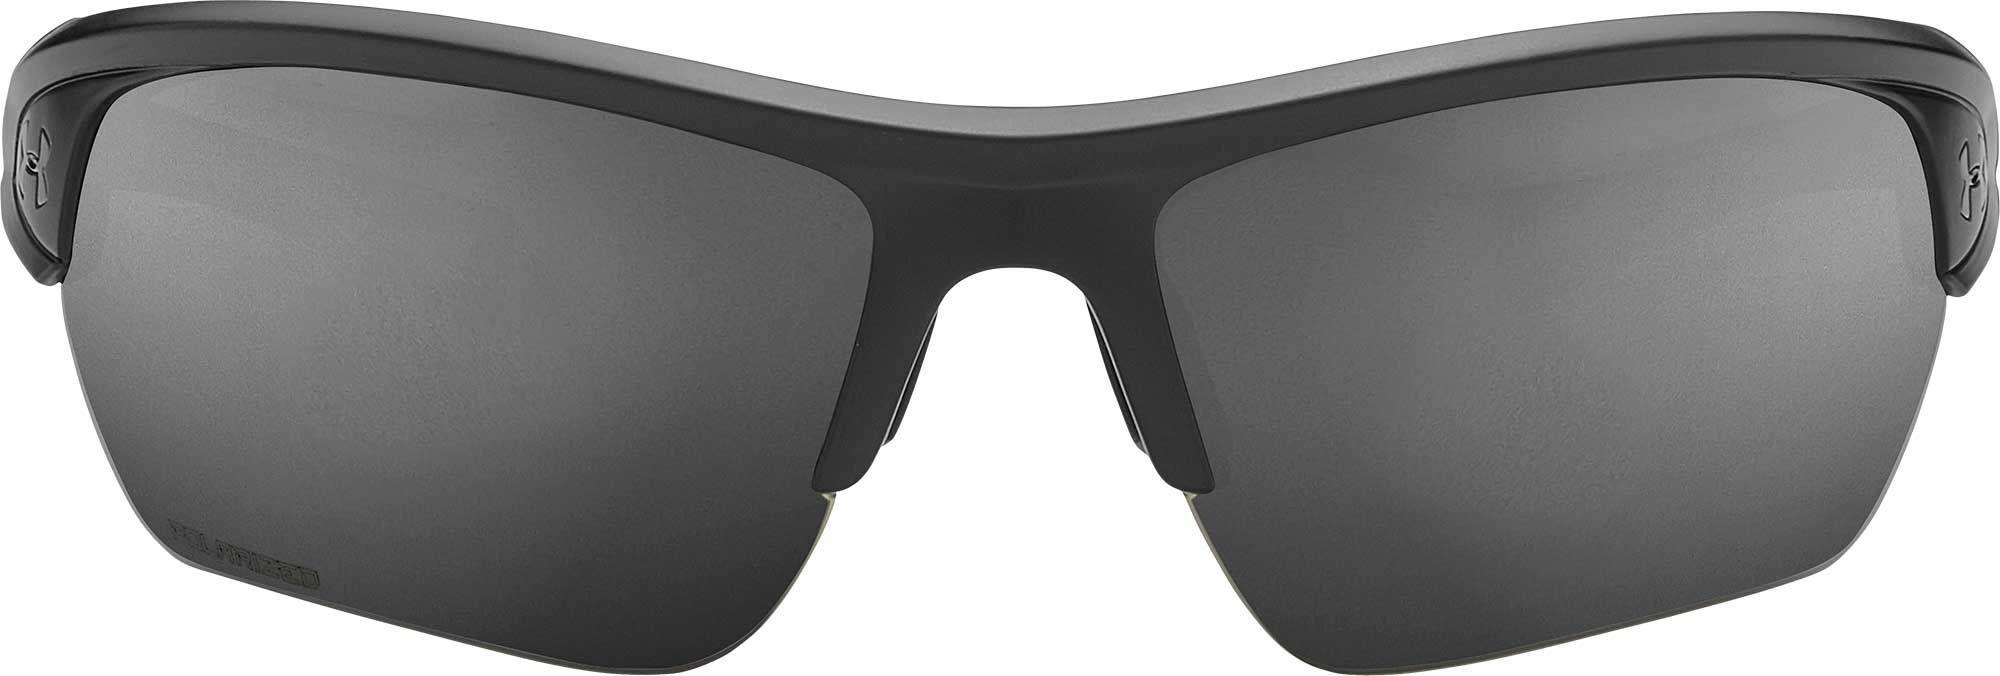 7831dbed1c8 Under Armour - Black Octane Running Polarized Sunglasses for Men - Lyst.  View fullscreen